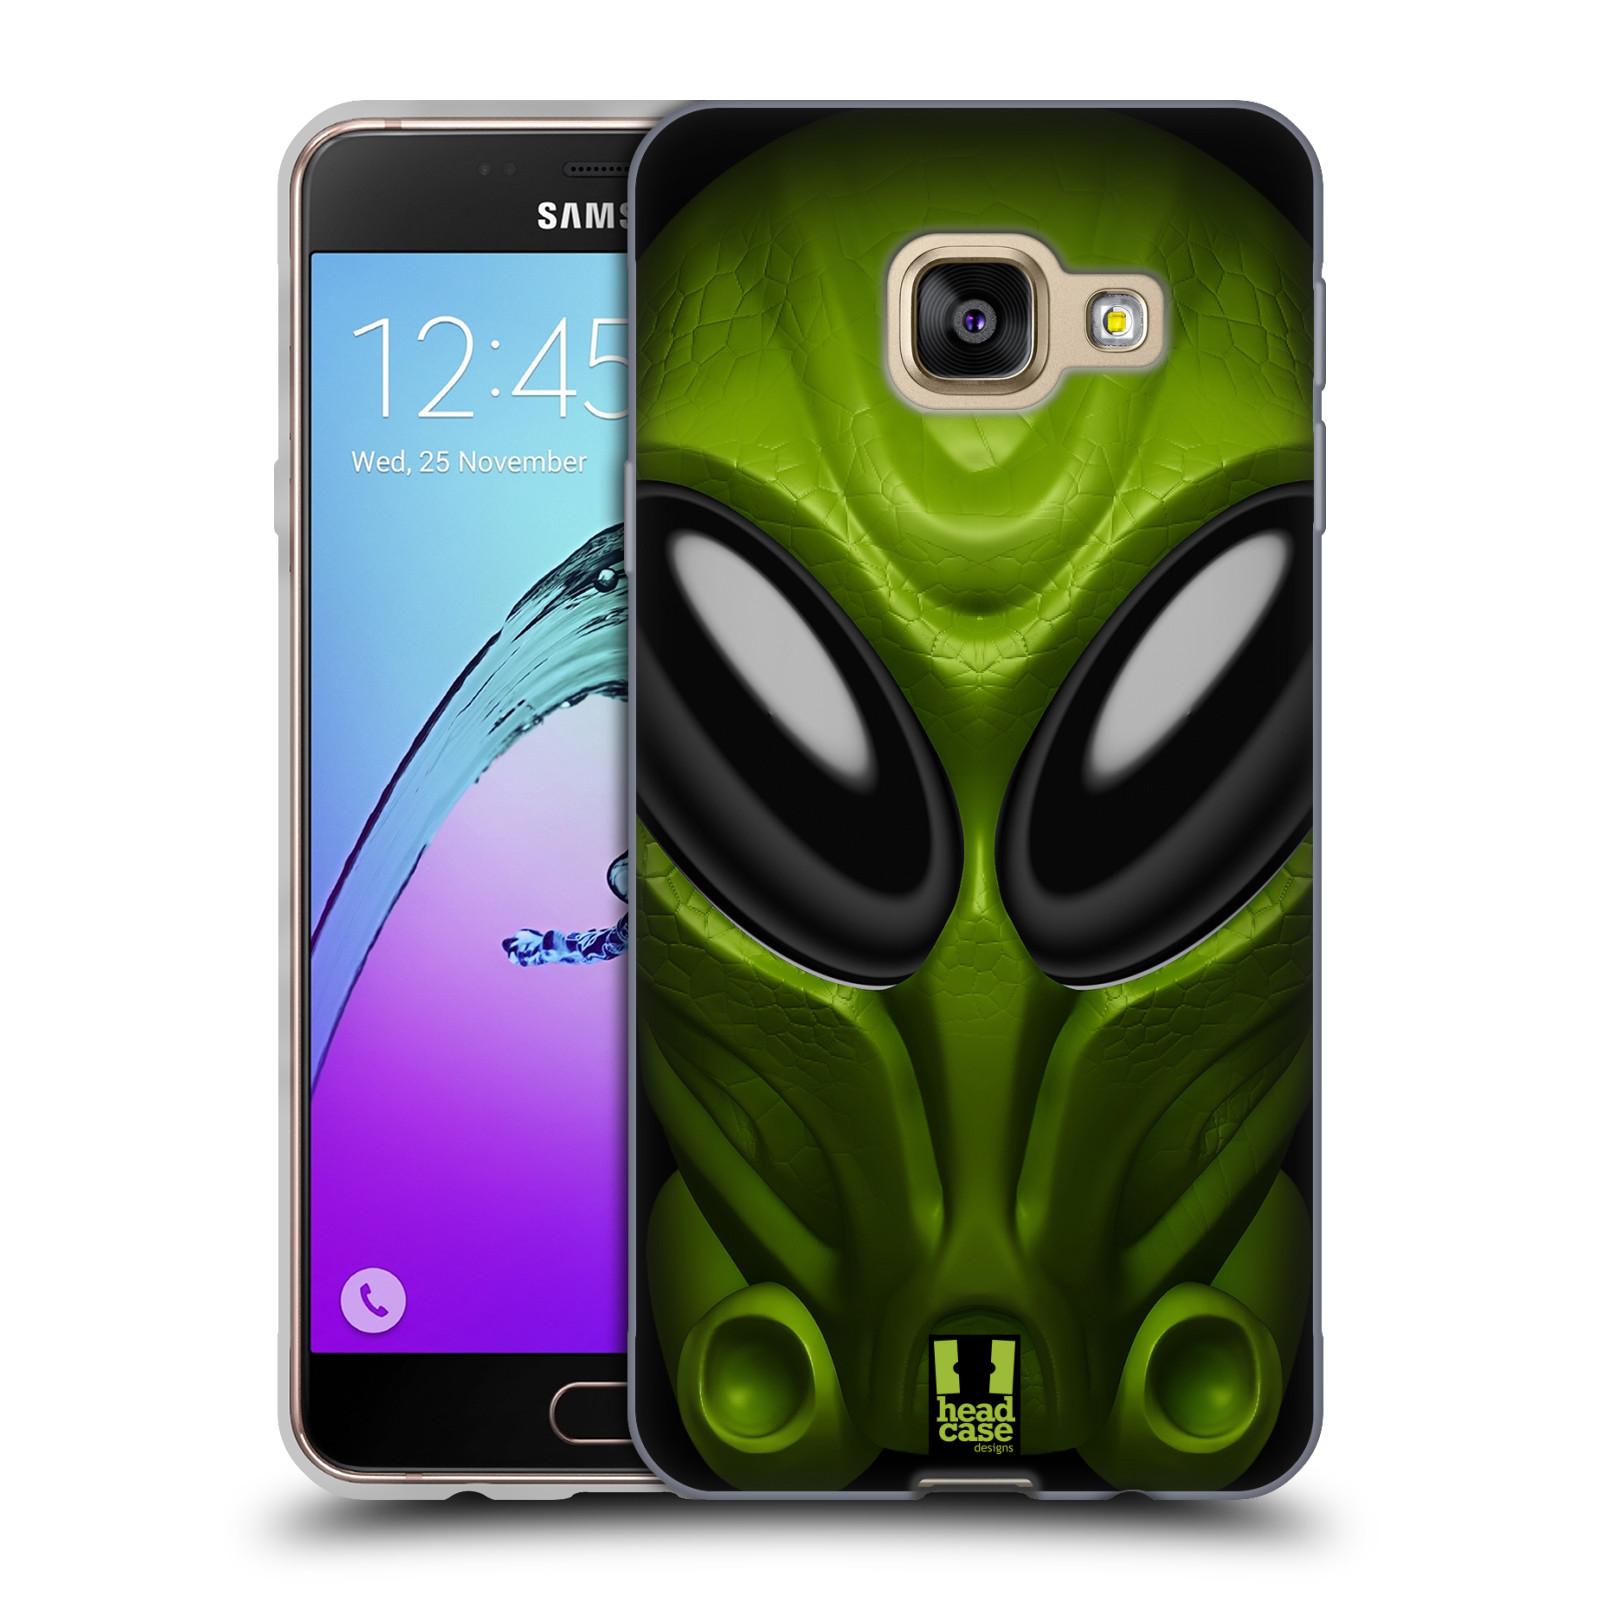 Silikonové pouzdro na mobil Samsung Galaxy A3 (2016) - Head Case - Ufoun Mastermind